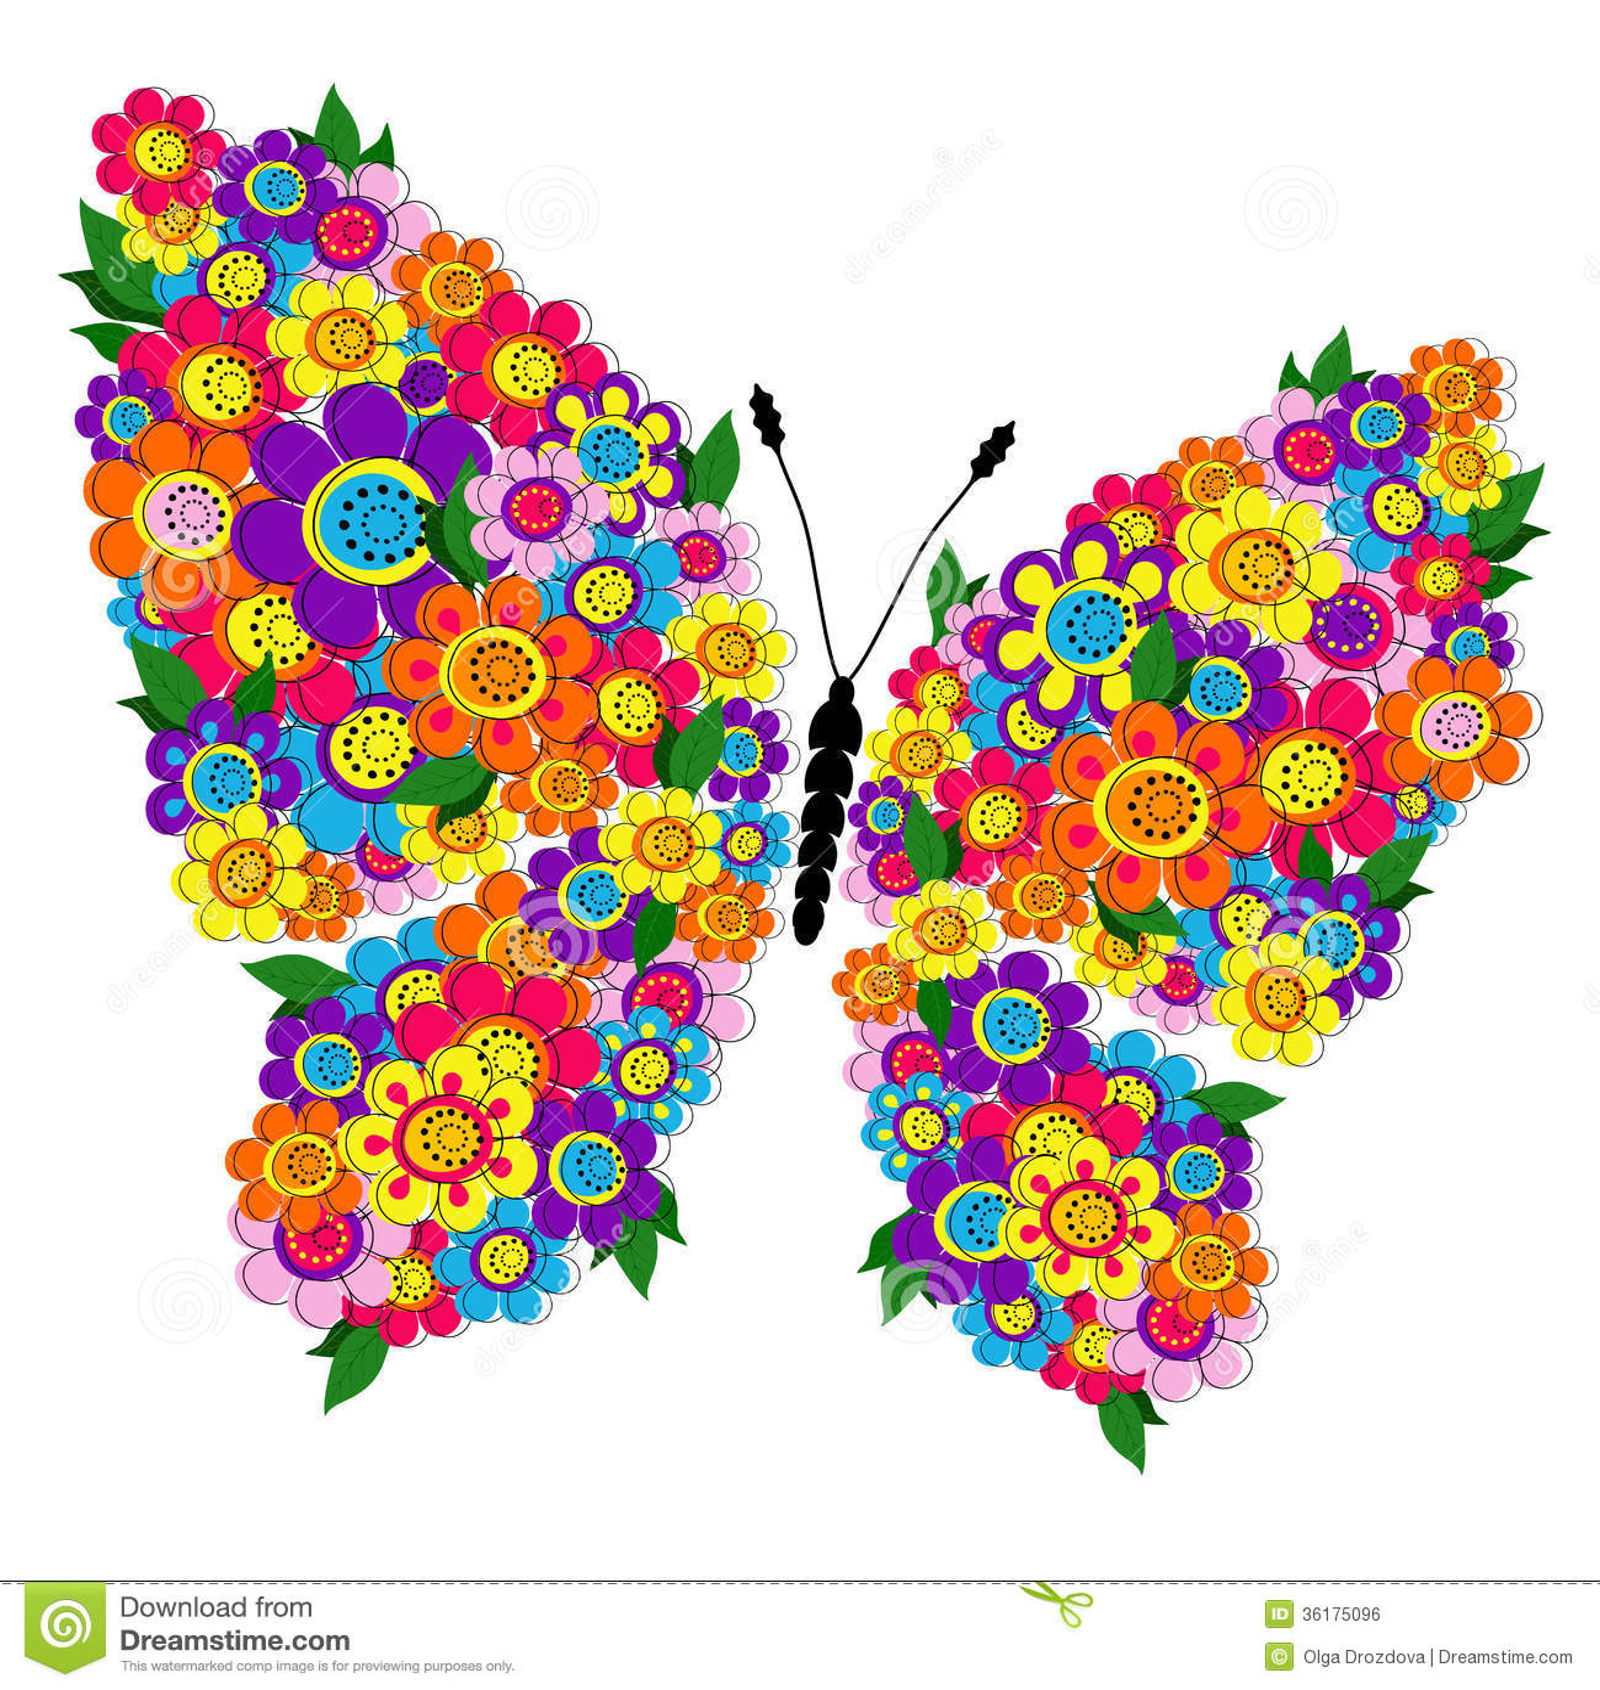 mariposa floral de la primavera imagen de archivo libre de. Black Bedroom Furniture Sets. Home Design Ideas